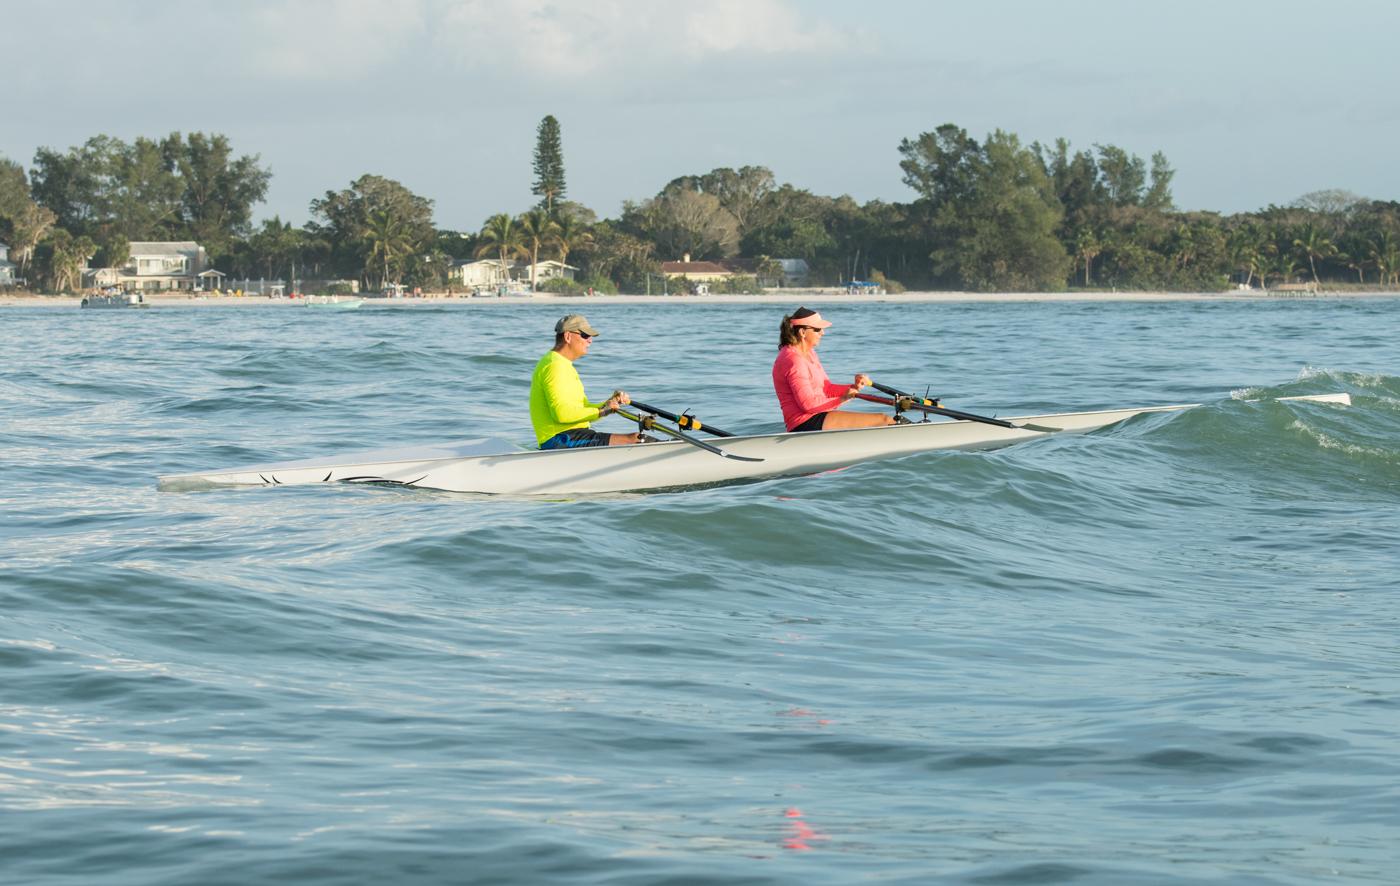 rowing_double-10.jpg